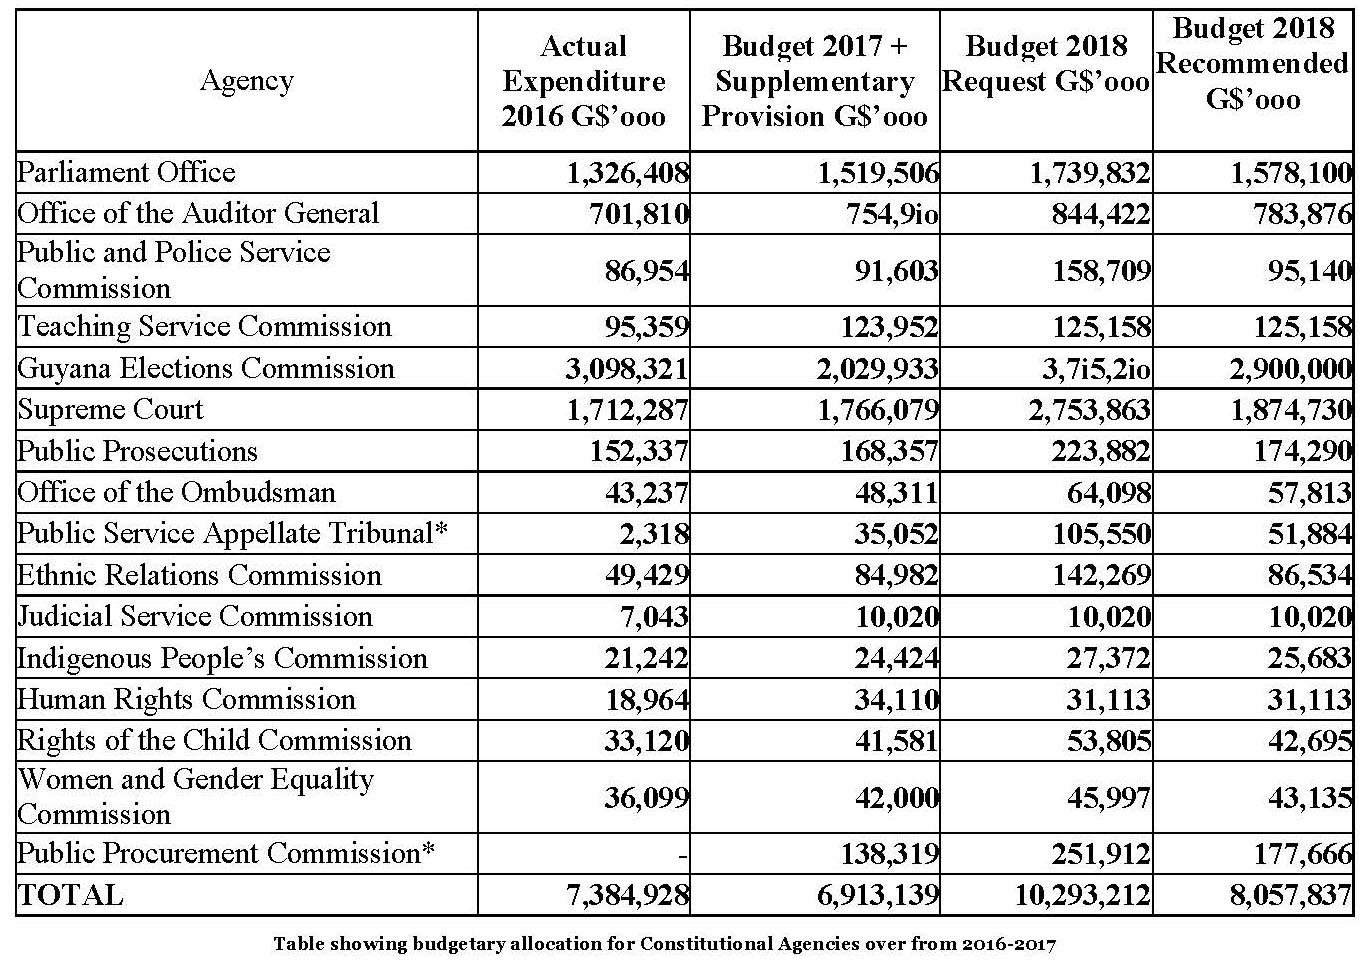 Finance Ministry Seeking To Slash Gecom Budget Request By